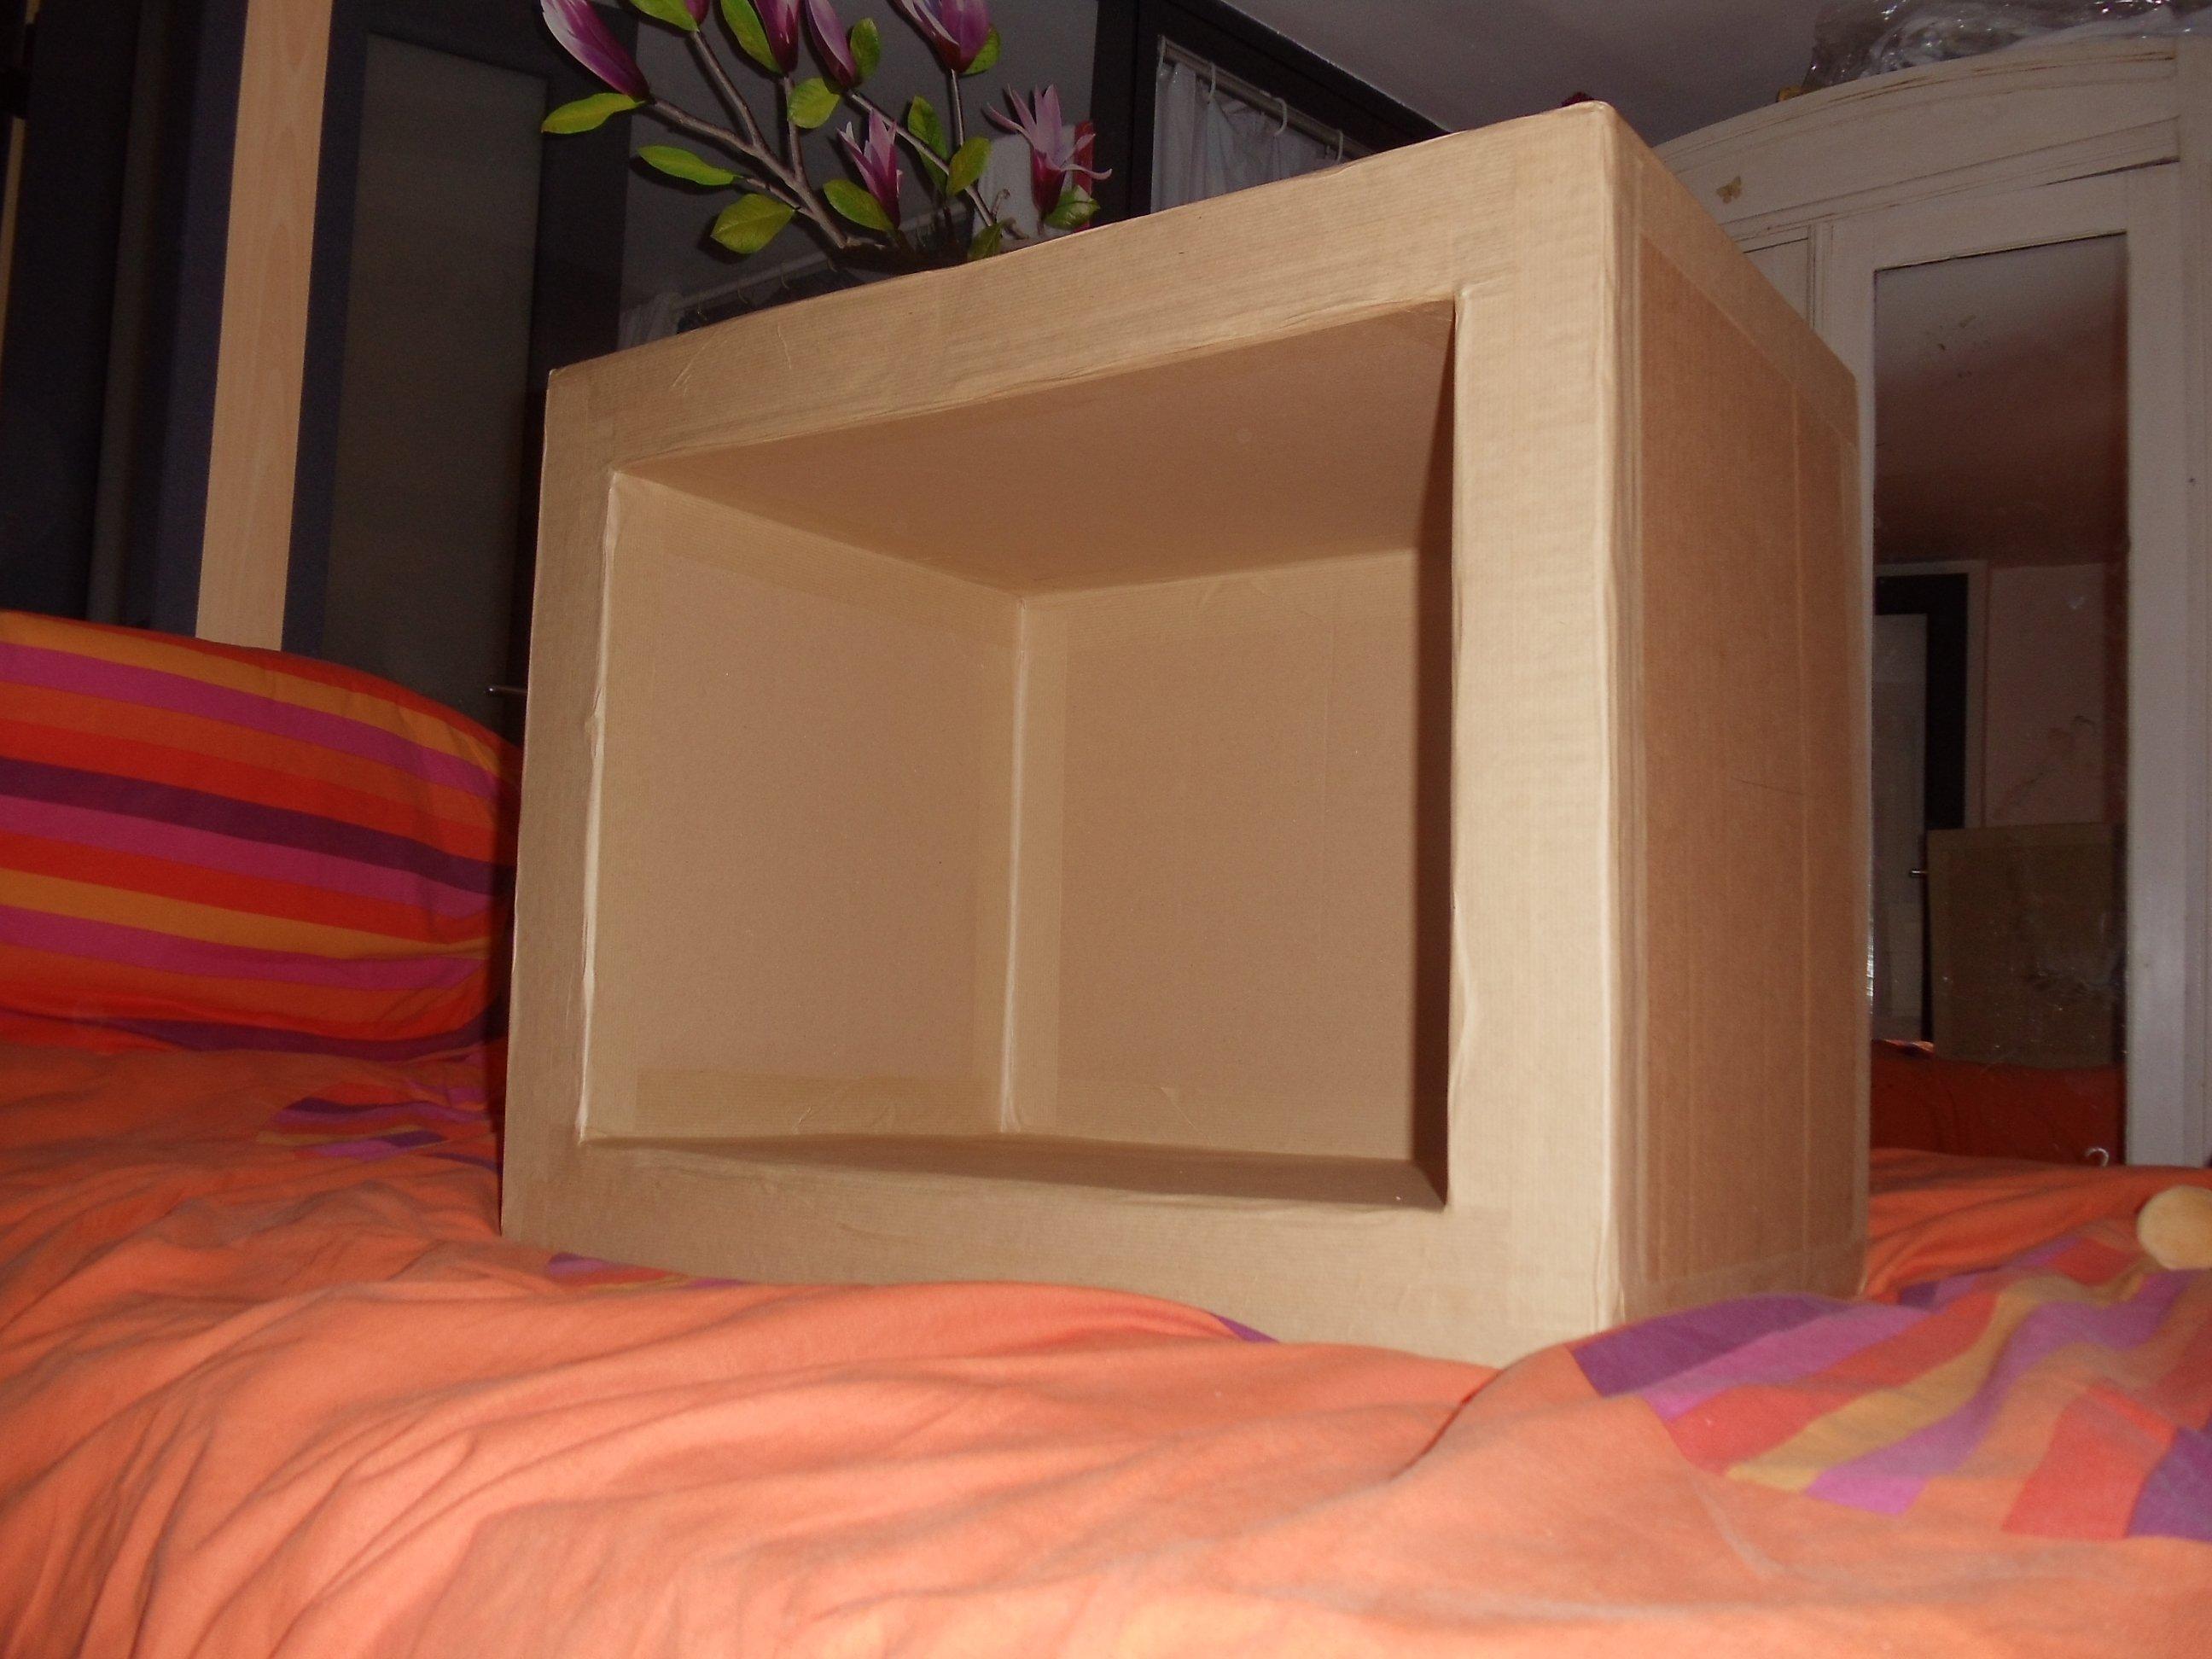 Image De Meuble En Carton meuble en carton - débuter et faire son premier meuble (très